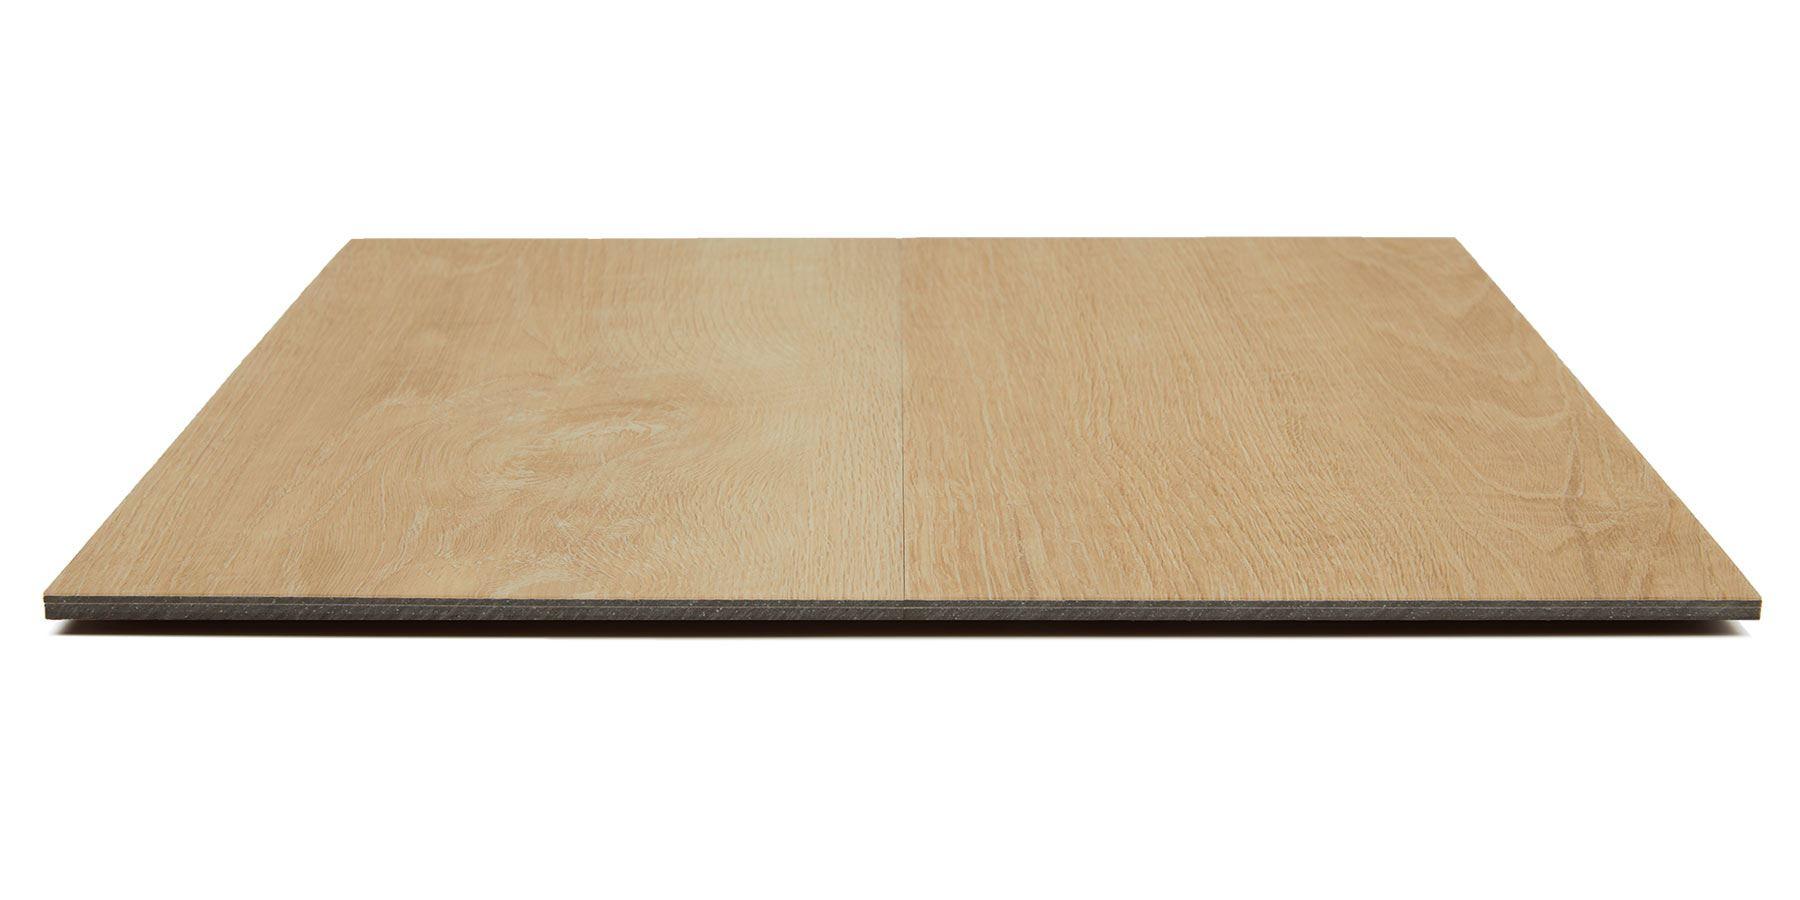 Hot And Heavy Secoya Commercial Vinyl Plank Flooring